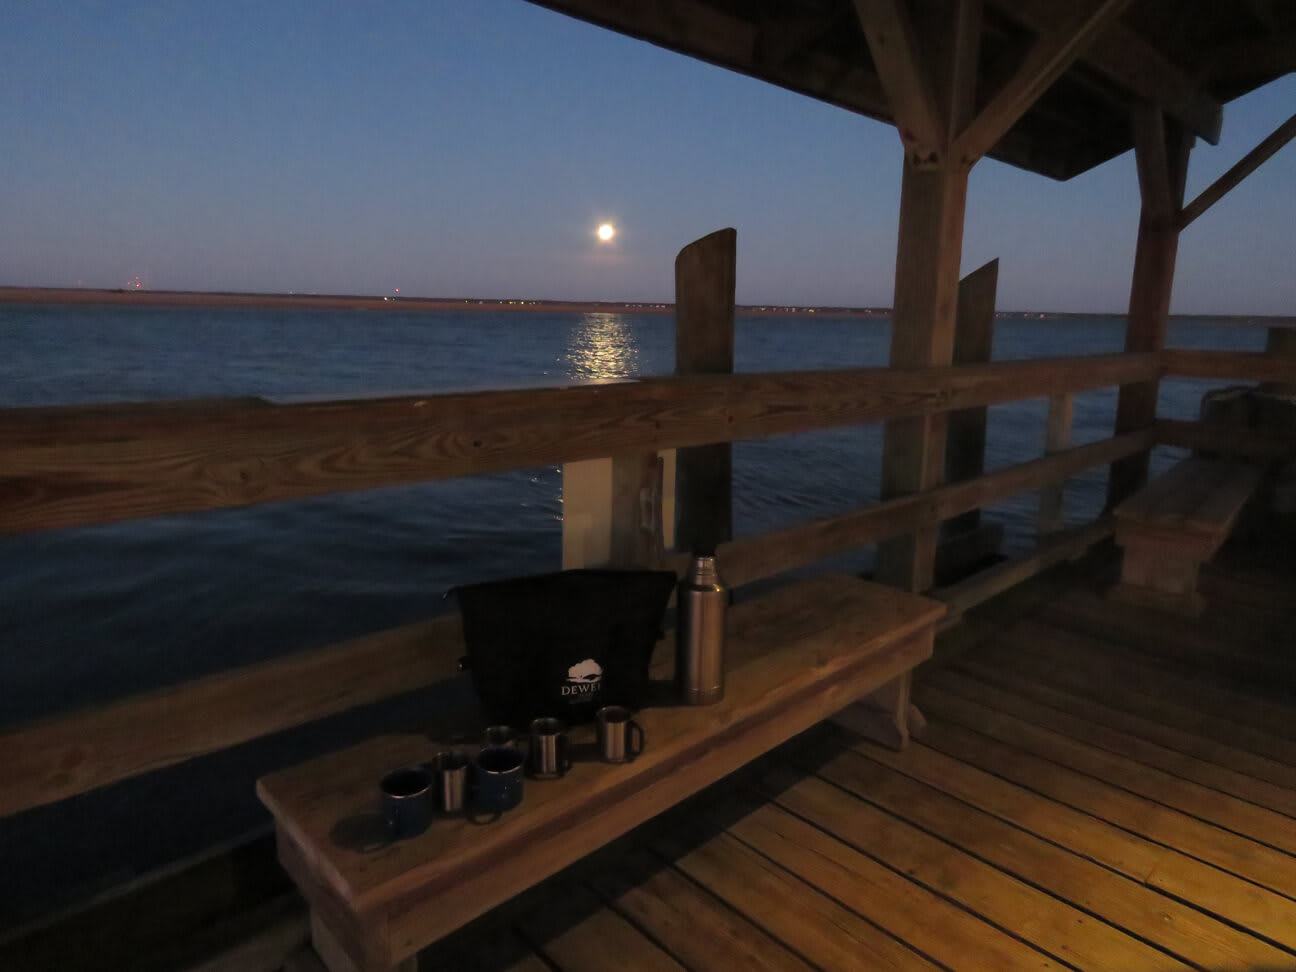 Super Blue Moon: Dewees Loves a Celebration